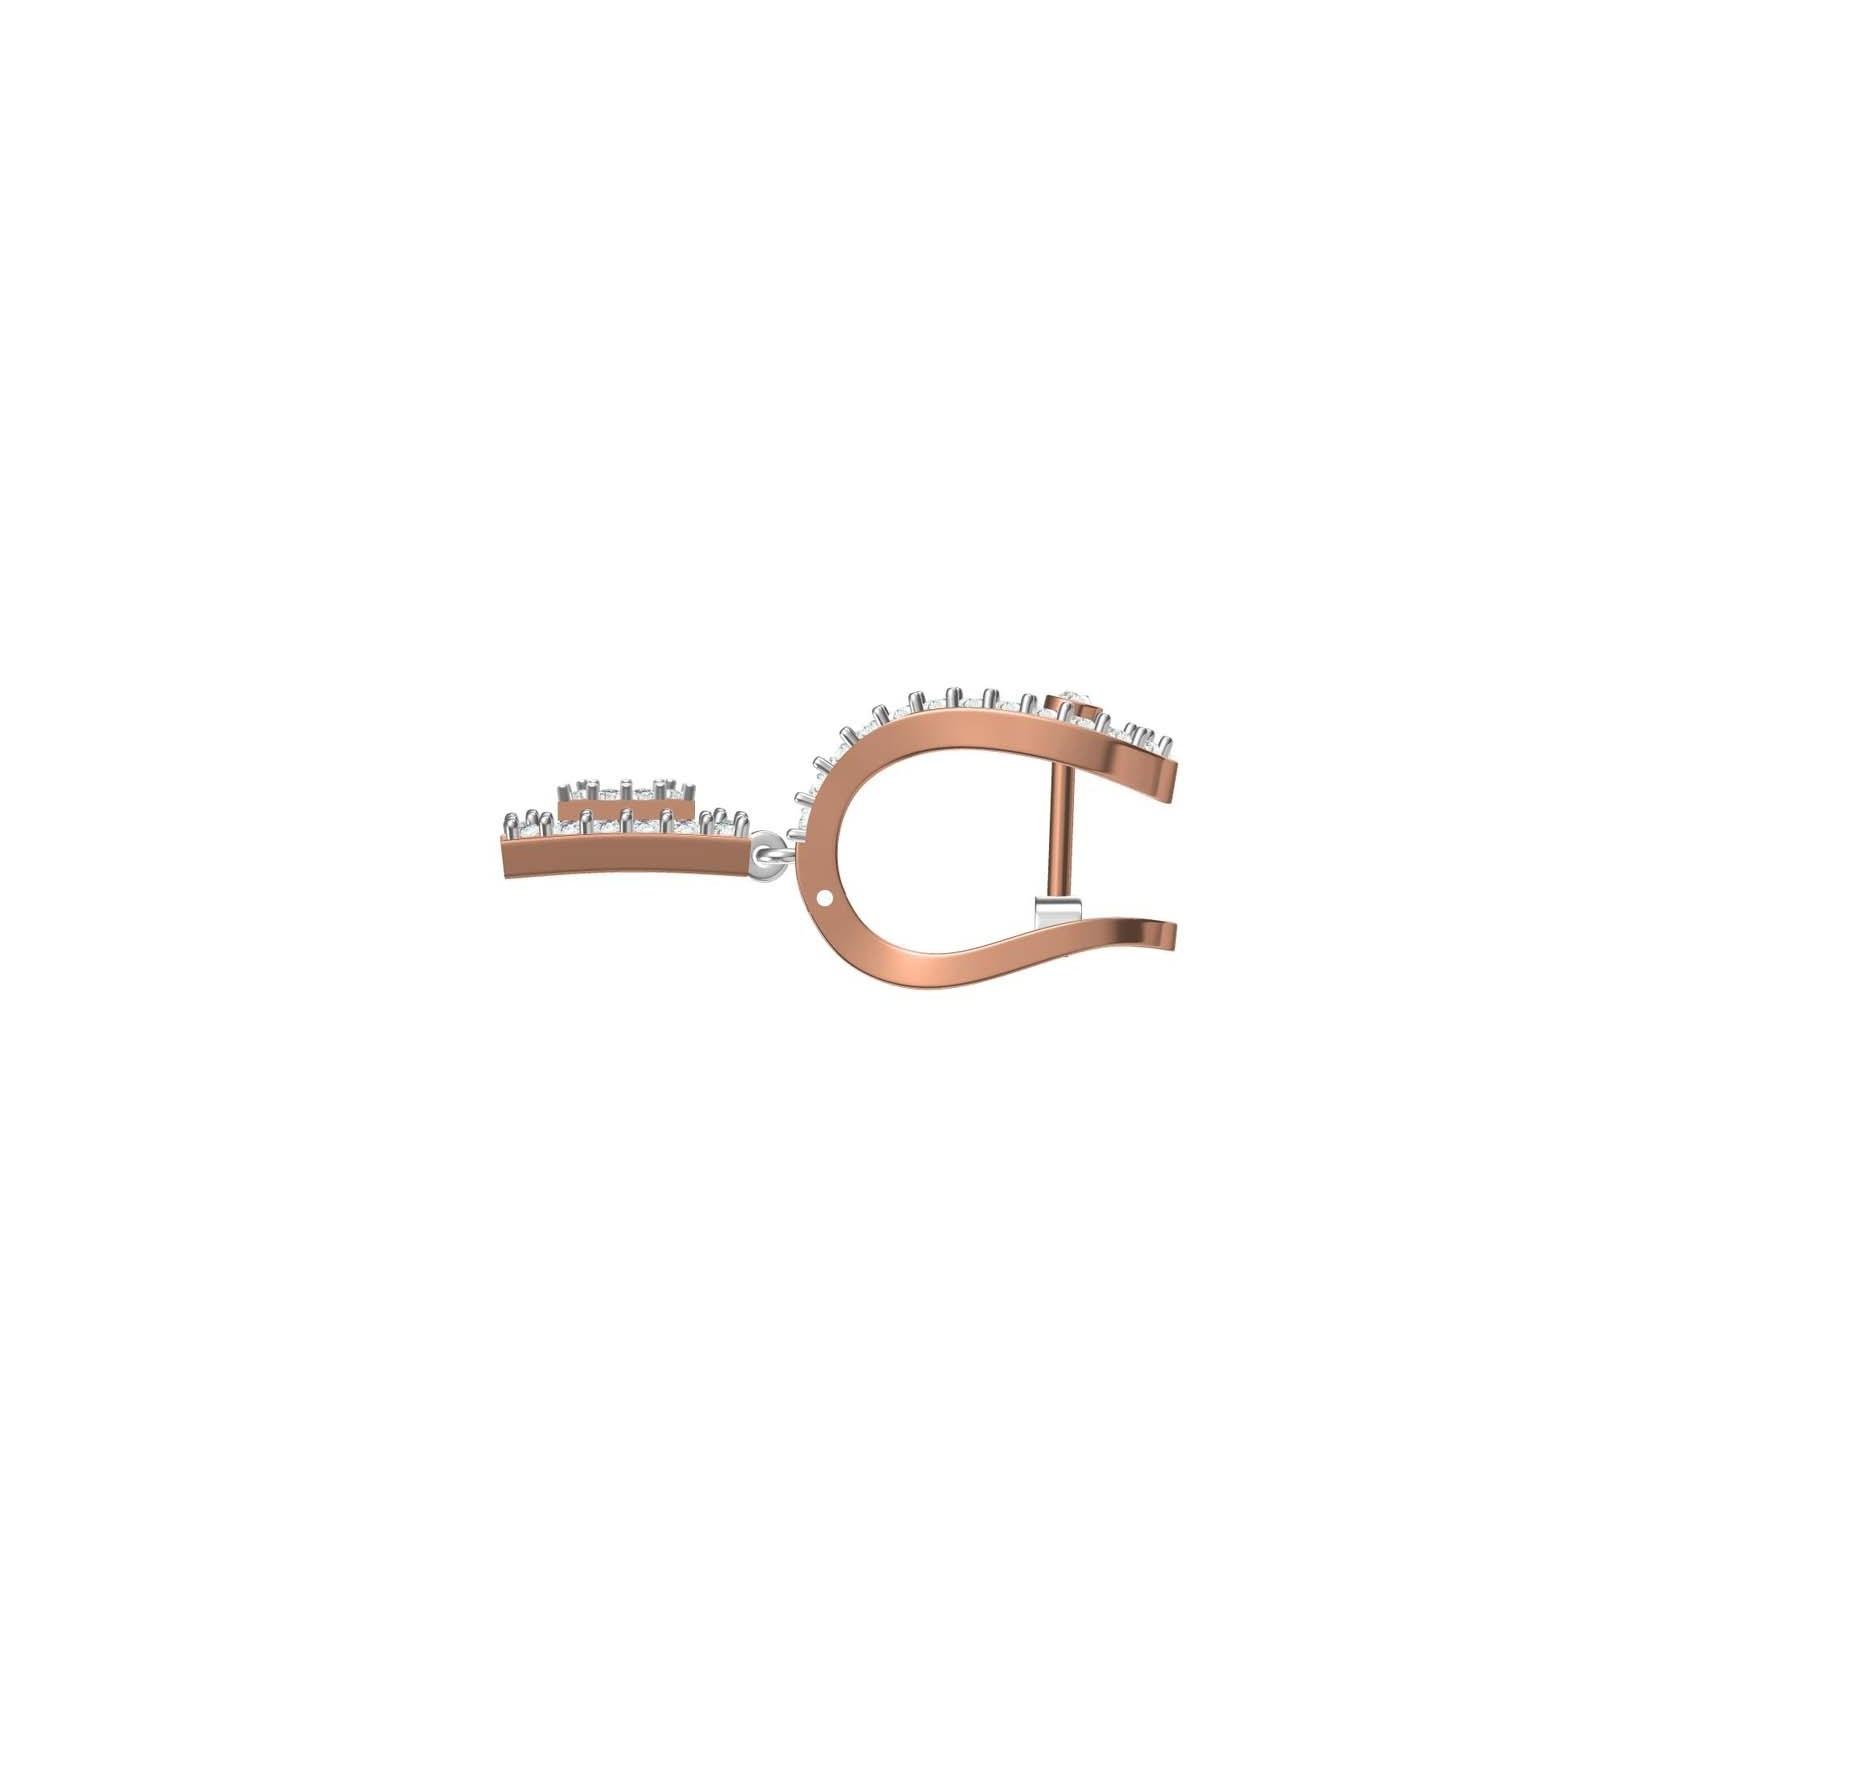 Diamond Earring TCW 1.495ct 14K gold 8.6 gm